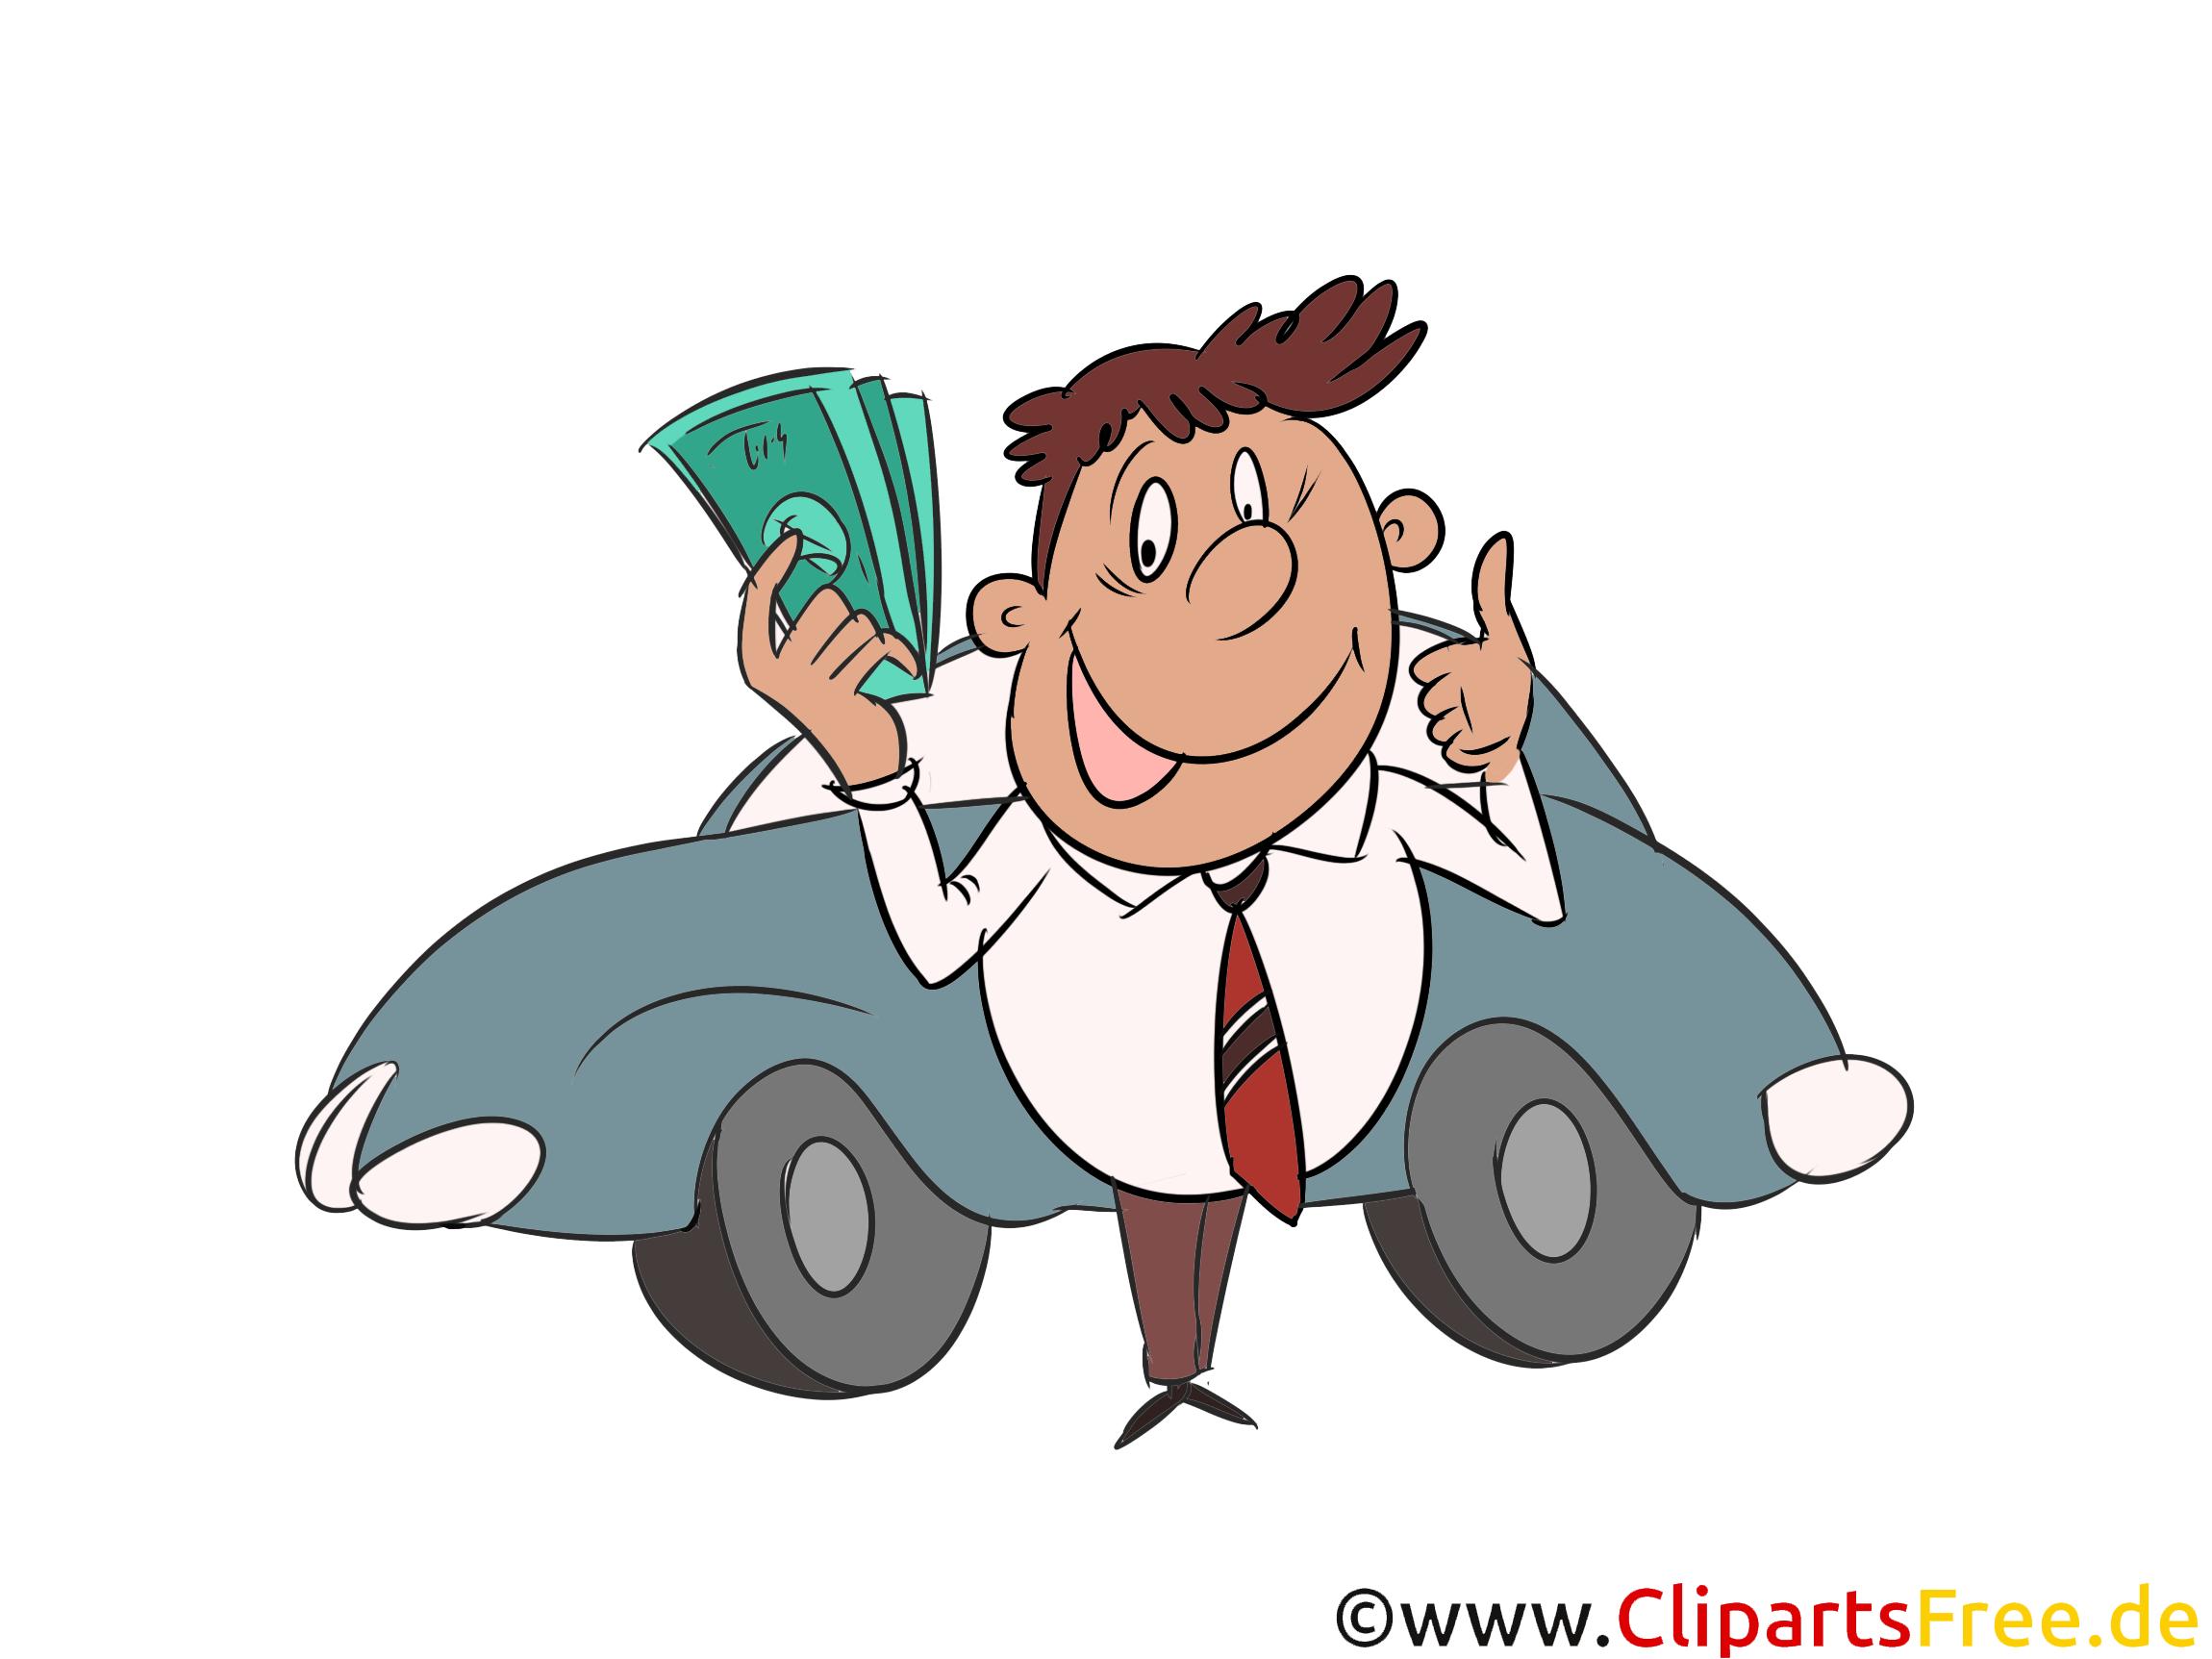 Auto-Finanzierung Clipart, Bild, Grafik, Illustration